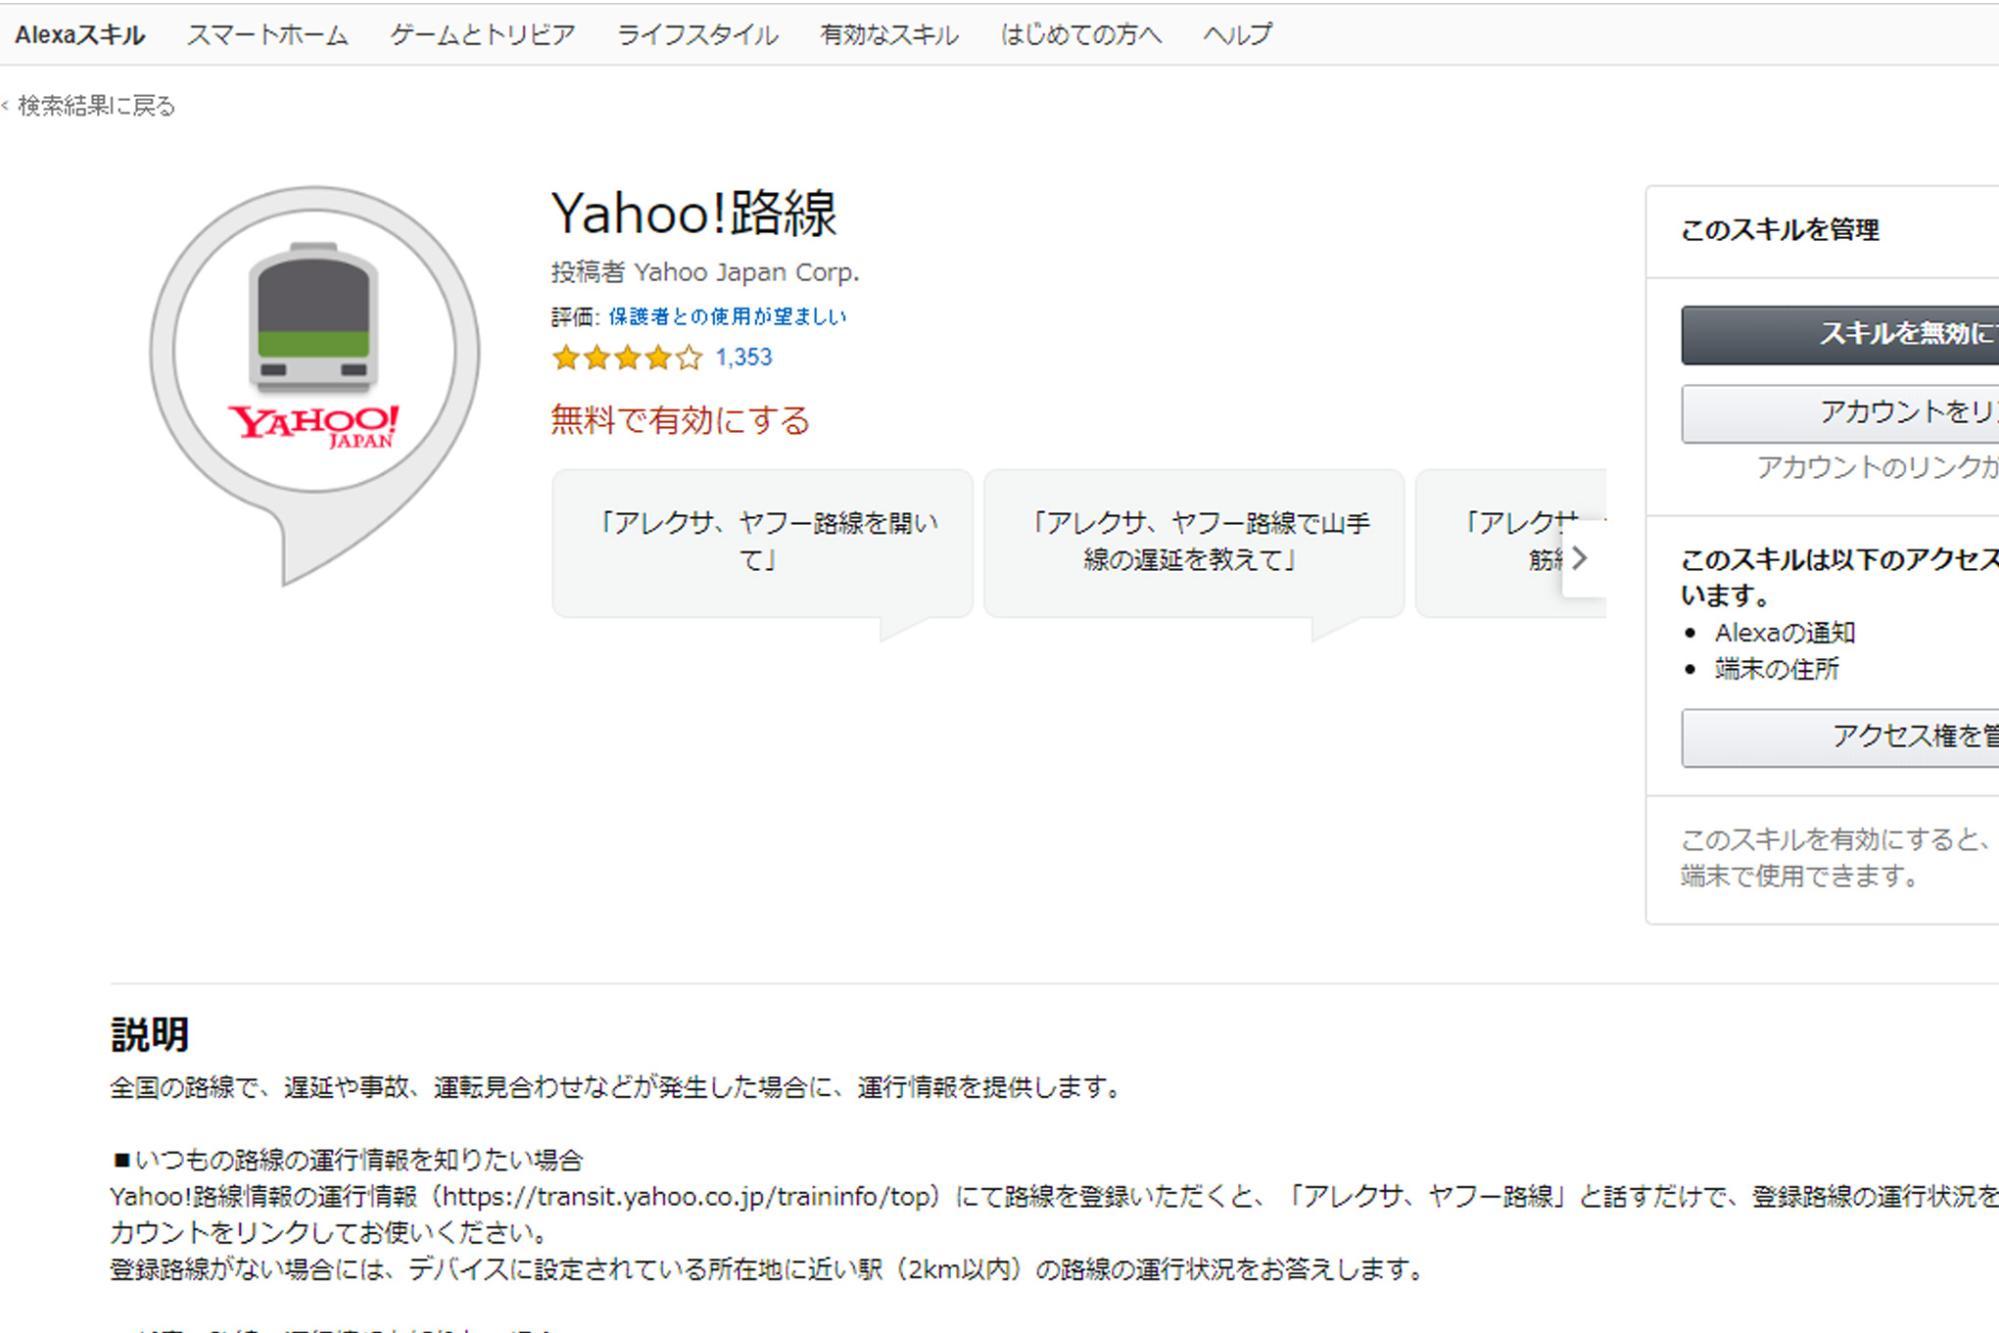 AmazonEchoスキル「Yahoo!路線」